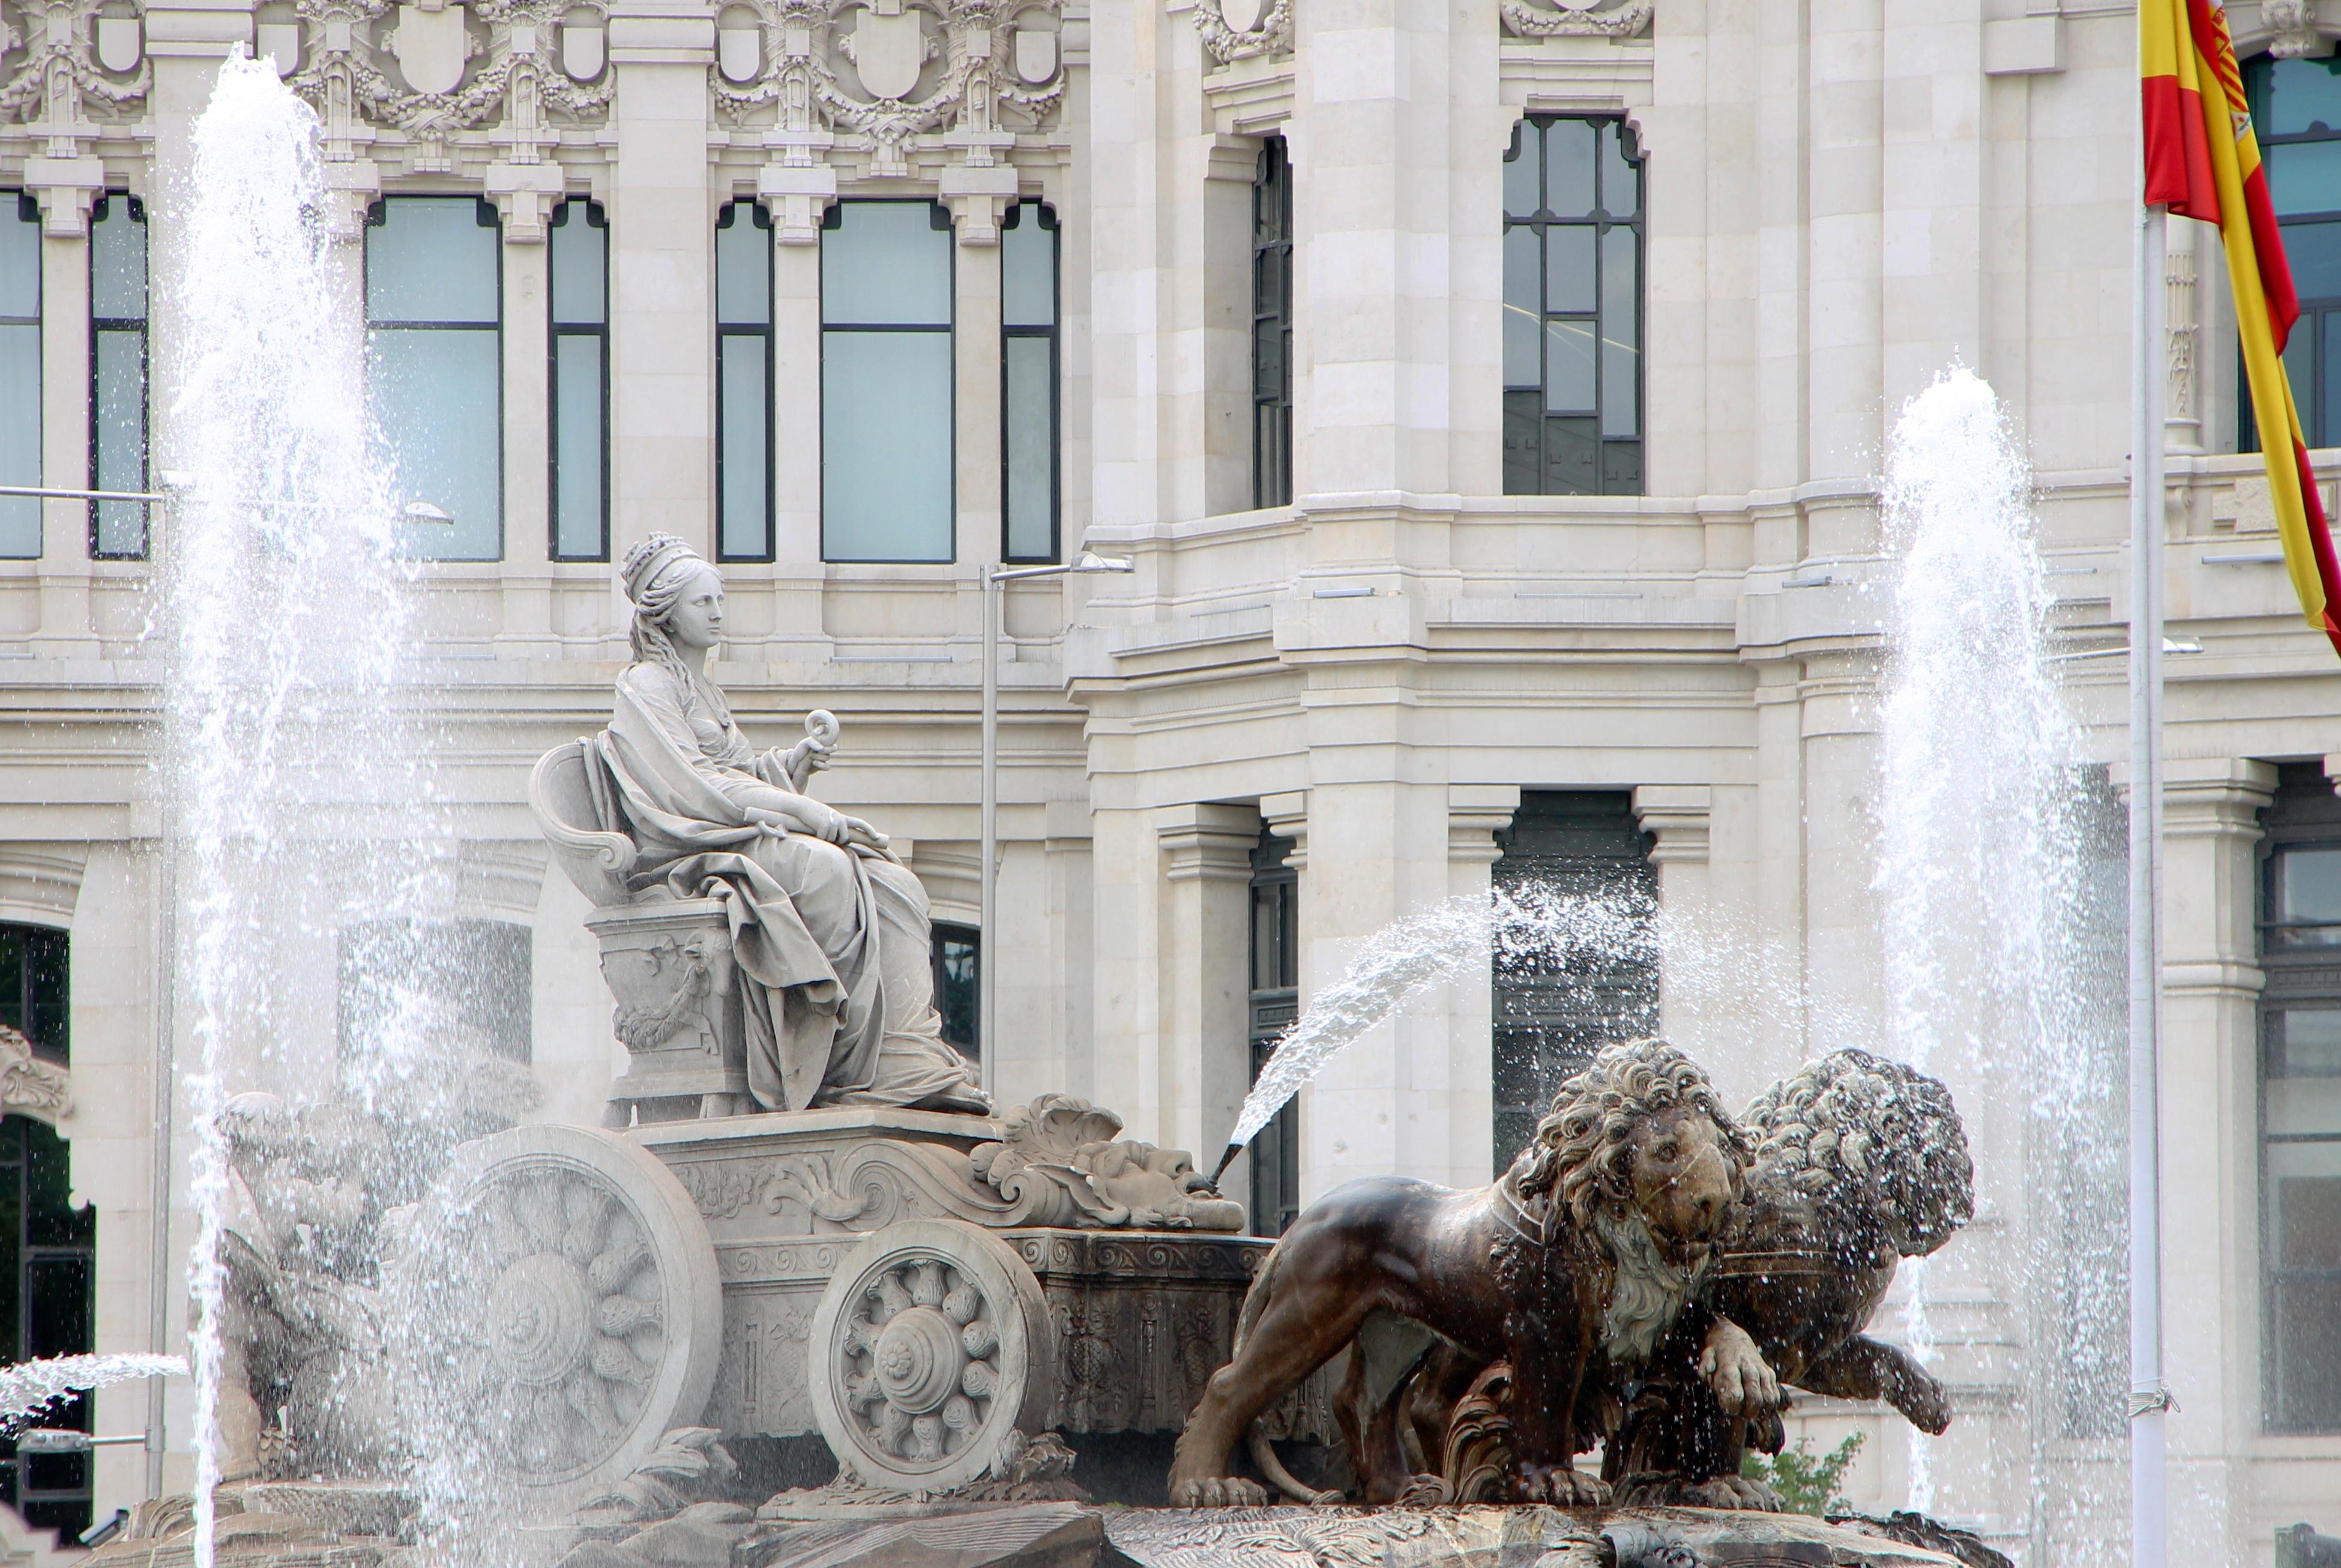 Мадрид. Фонтан Сибелес (Fuente de Cibeles)